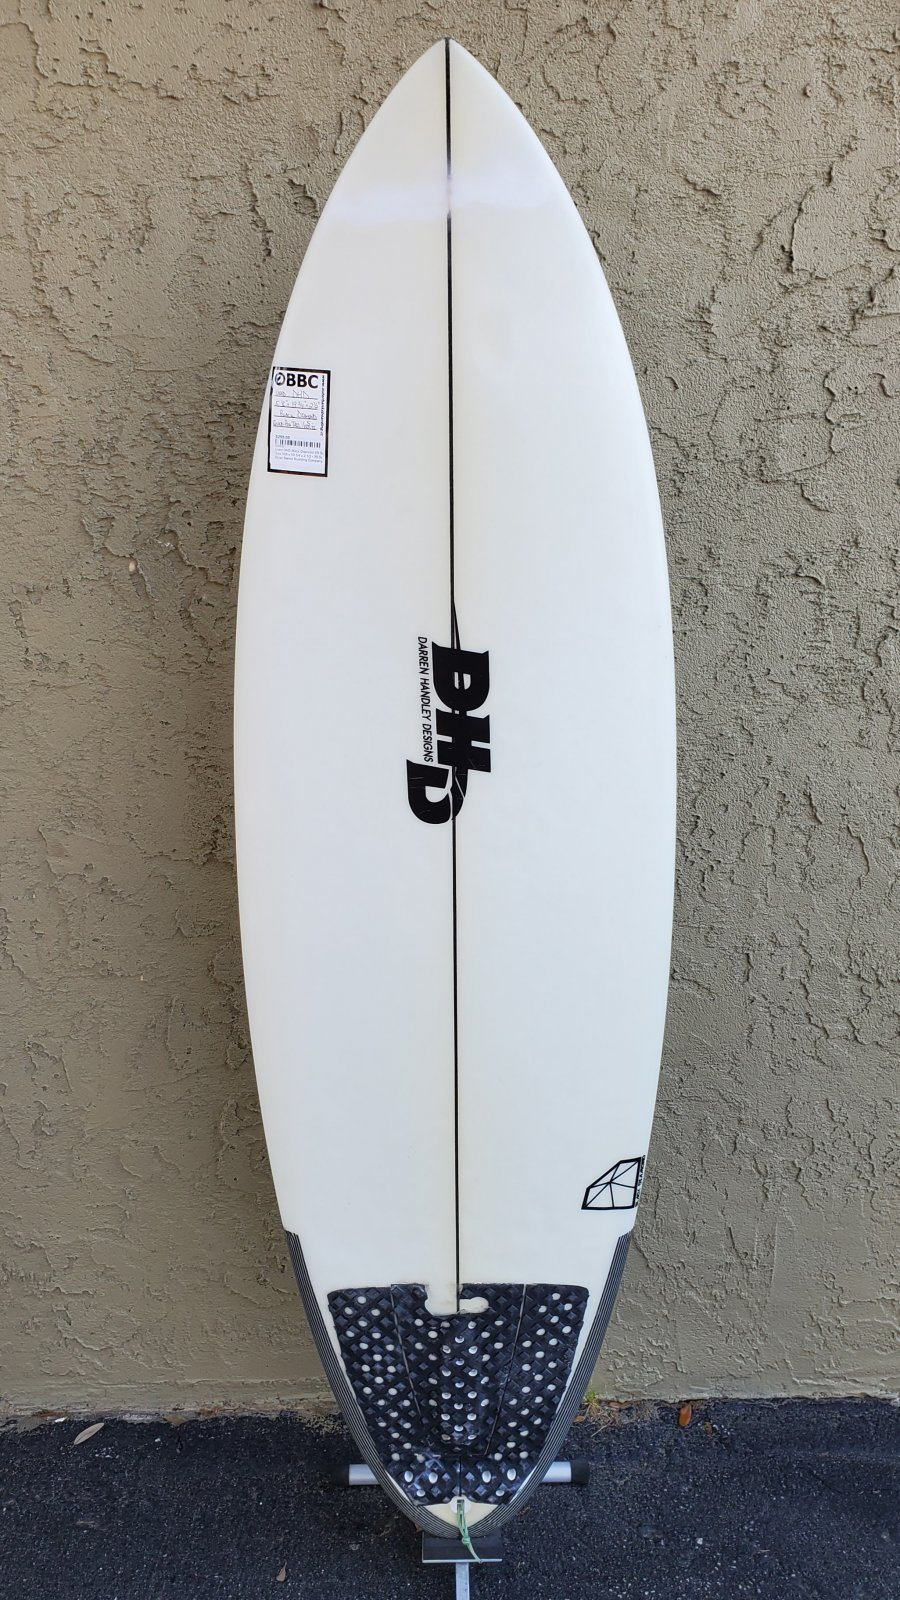 Used Con DHD Black Diamond 5'8 Surfboard